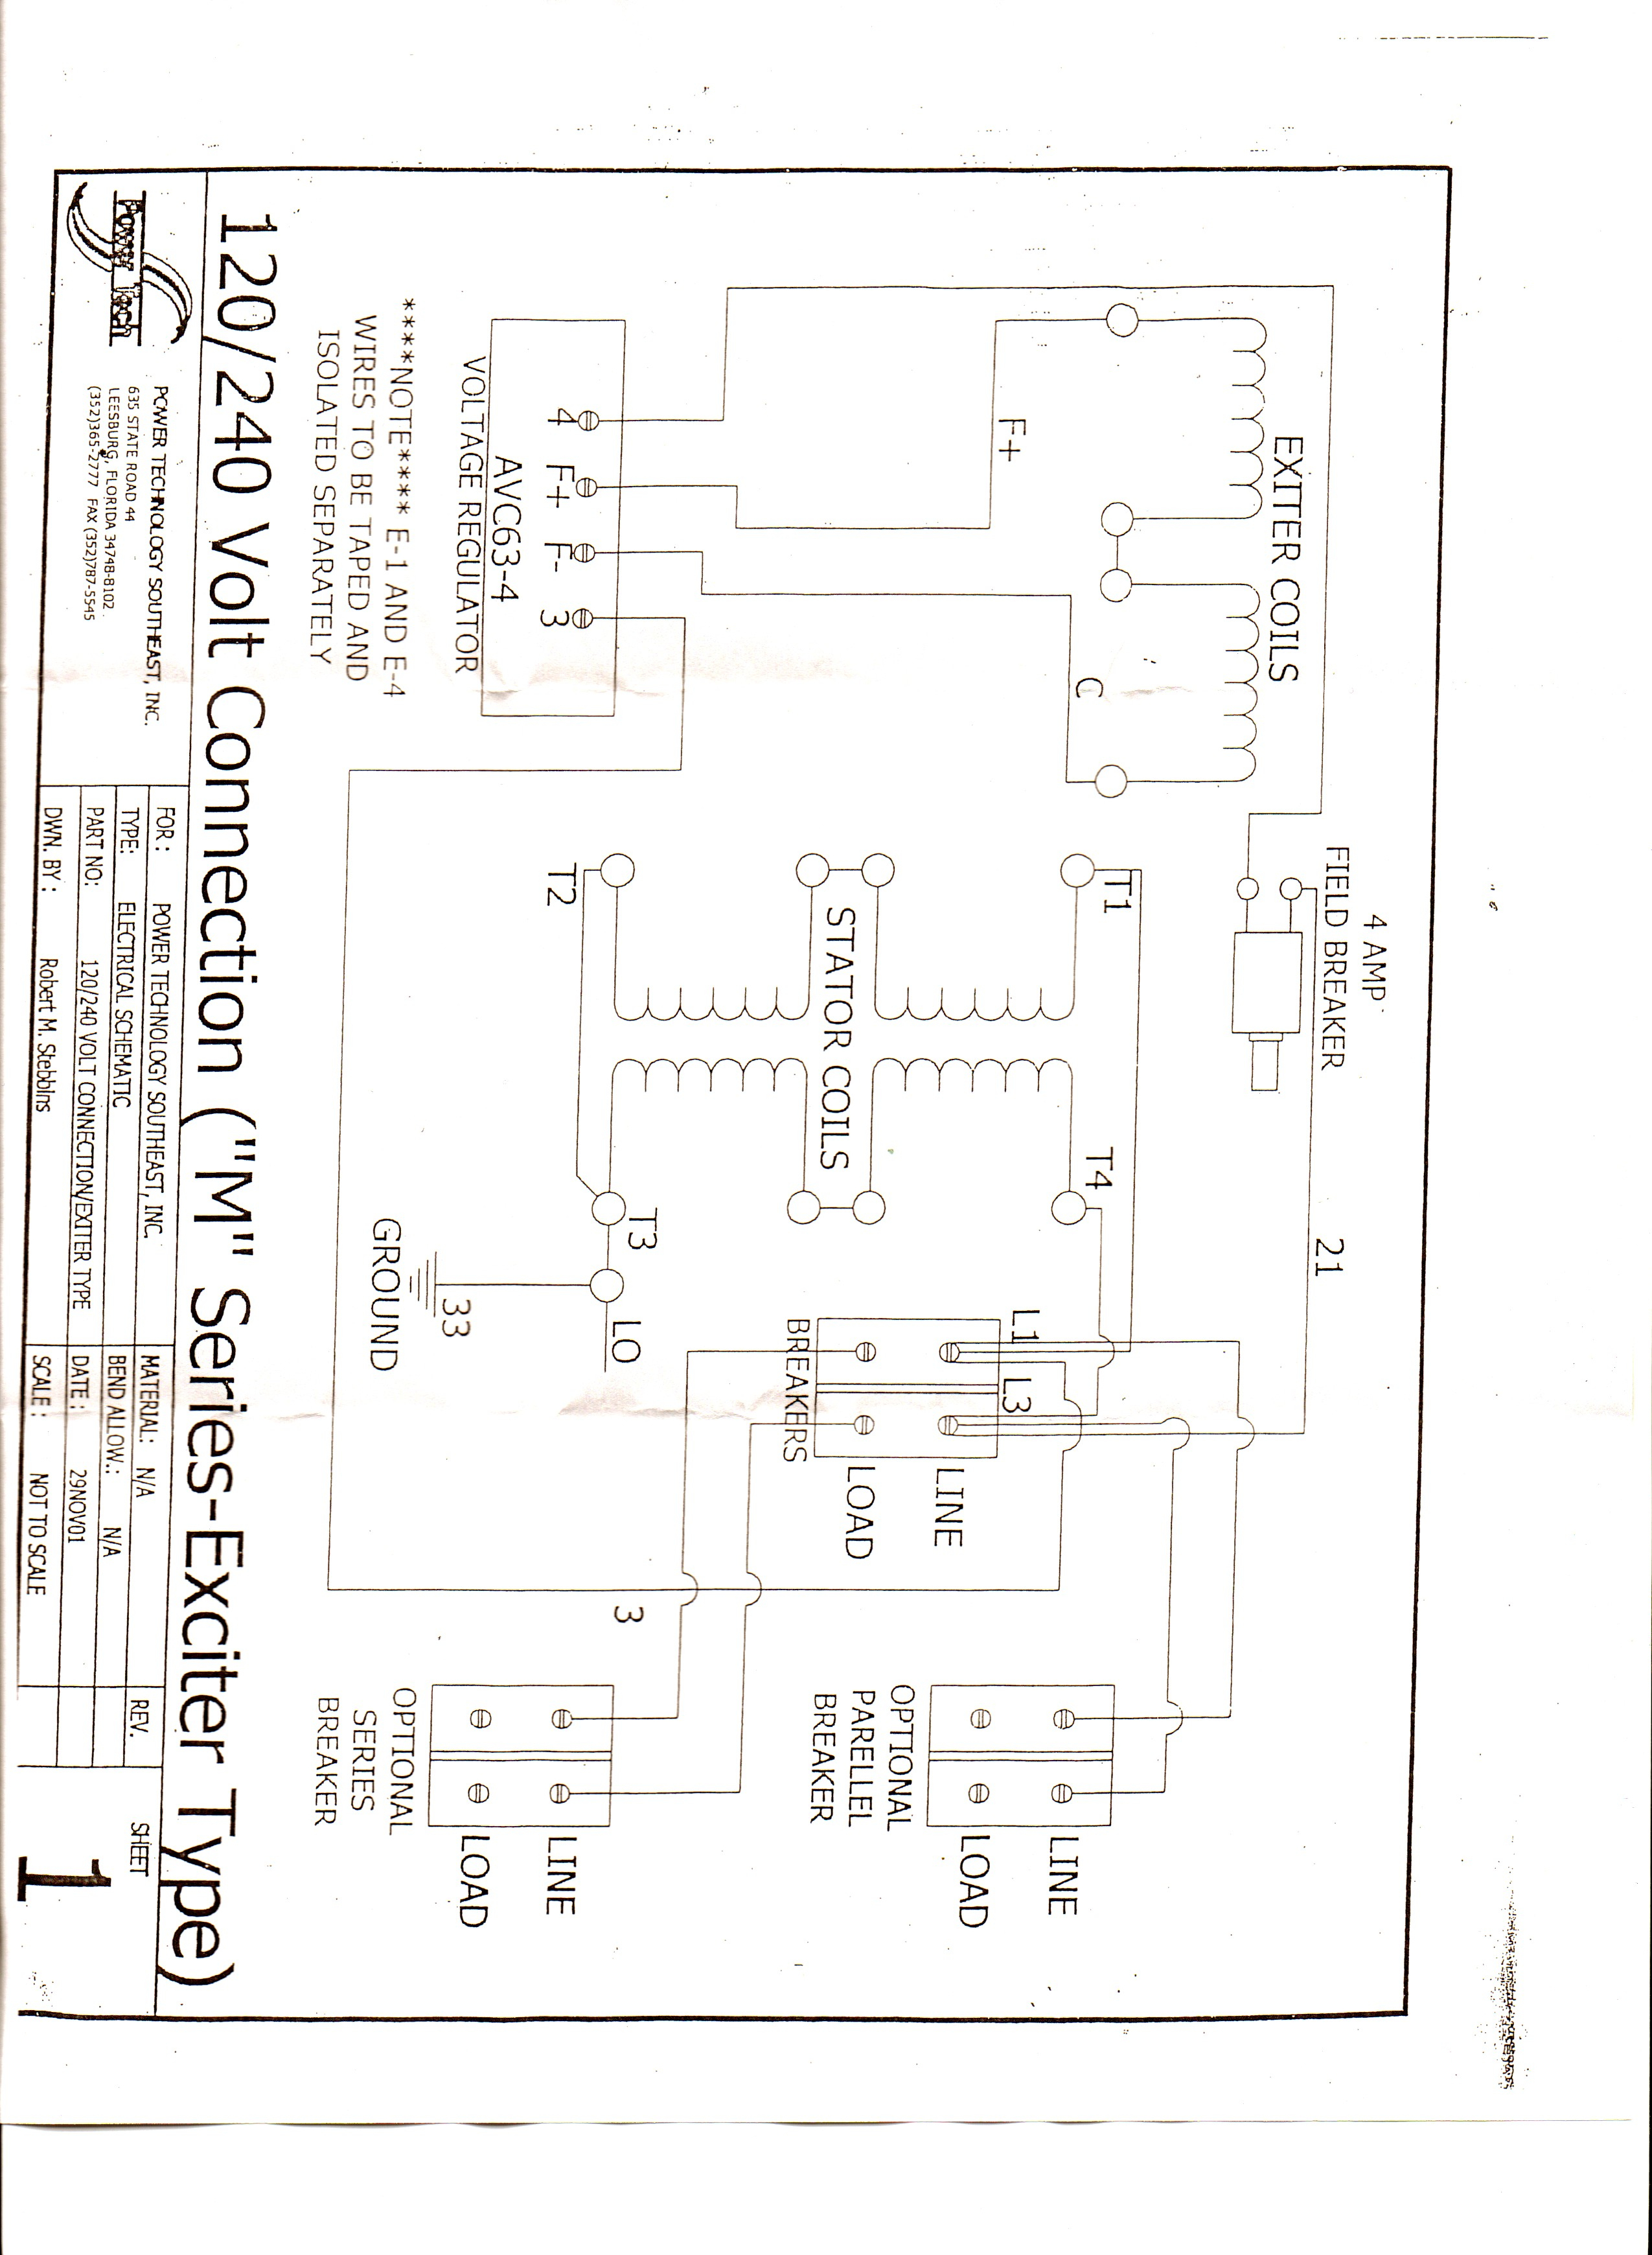 120V Wiring Diagram - Wiring Diagrams Hubs - Photocell Wiring Diagram Pdf